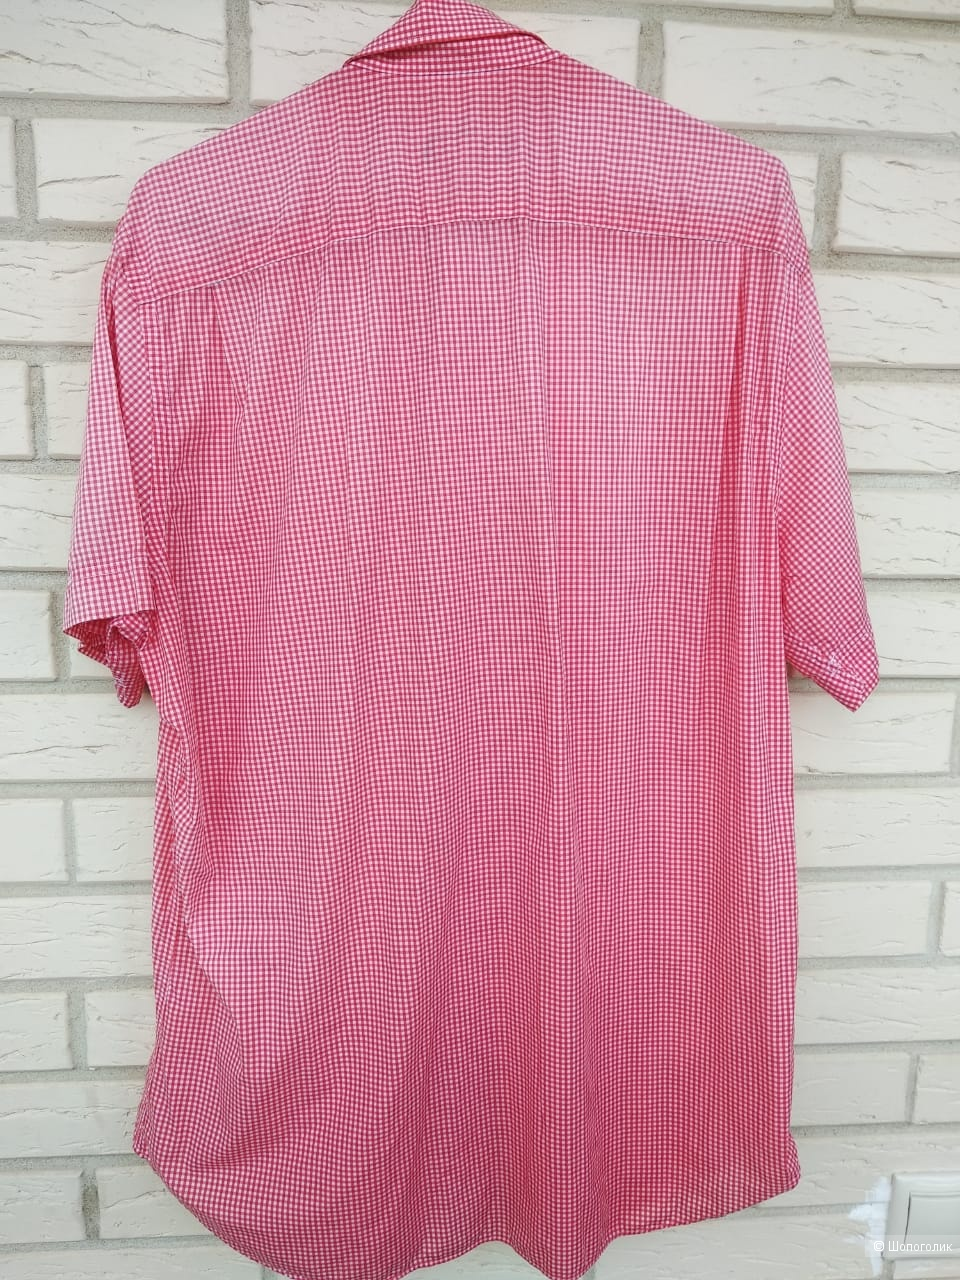 Рубашка Massimo Dutti, размер М (RU 46-48)